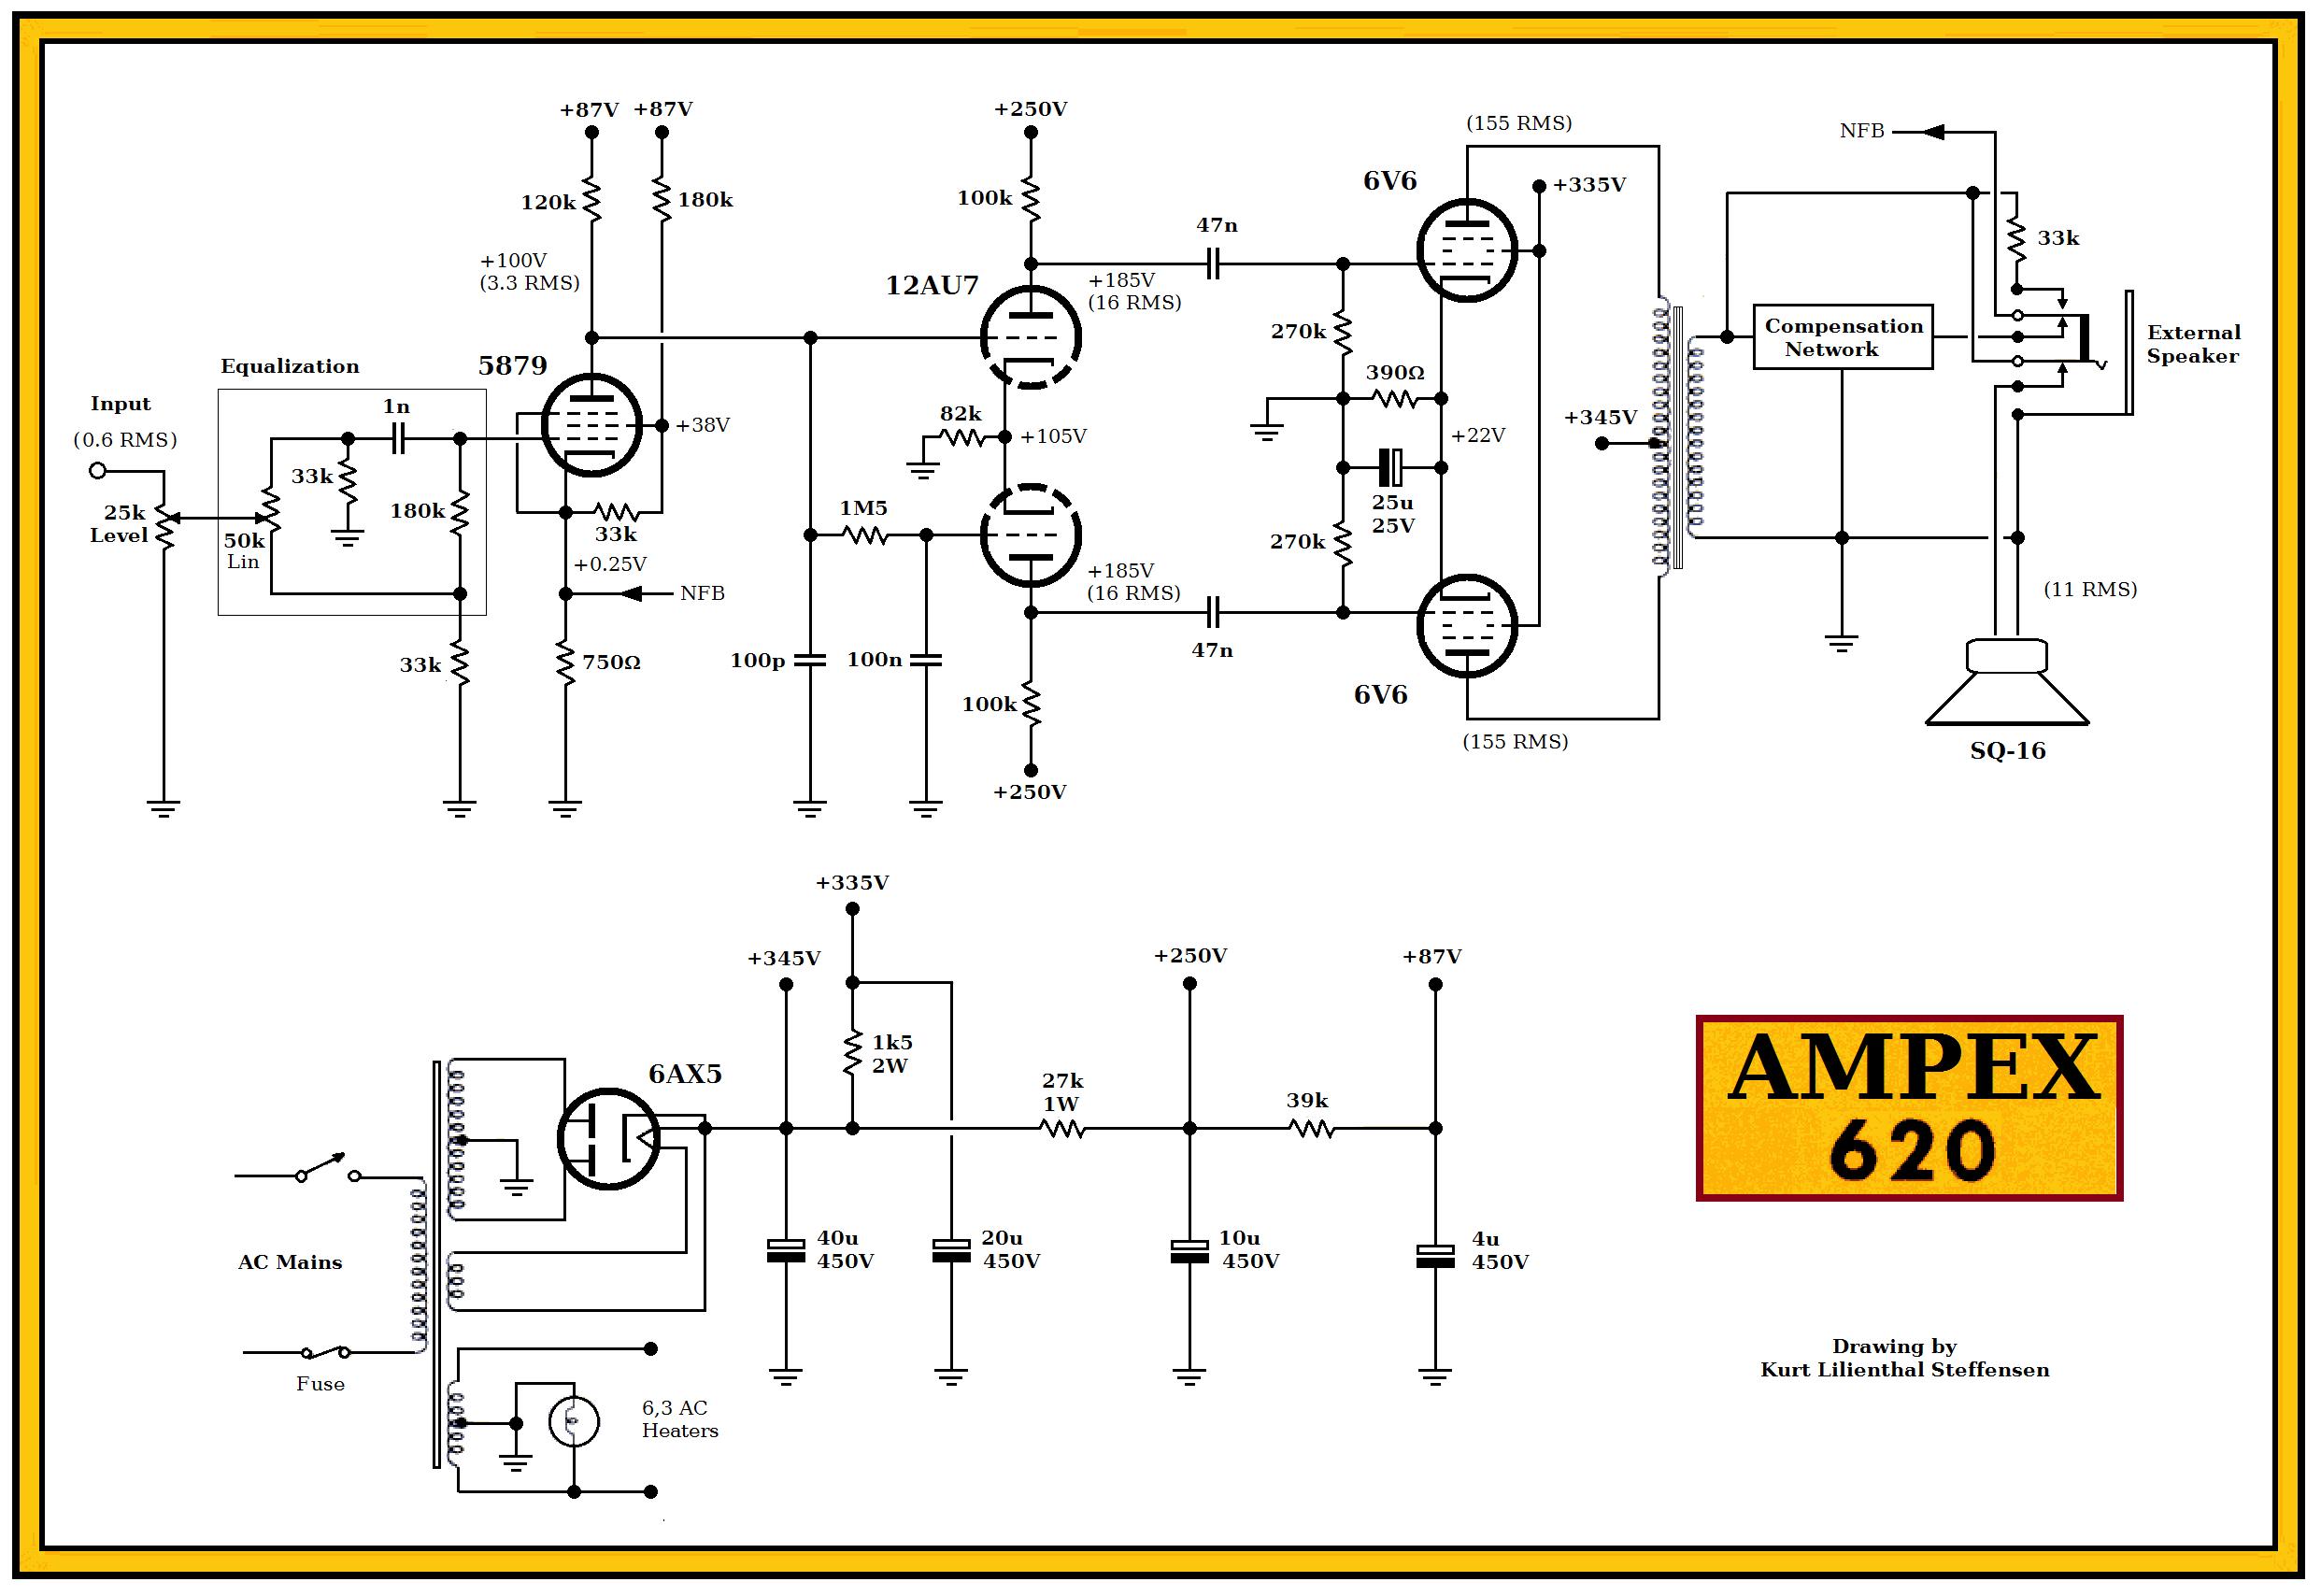 833420677_d1iCLrna_Ampex-620-6V6-PP-ed Quad Schematic on